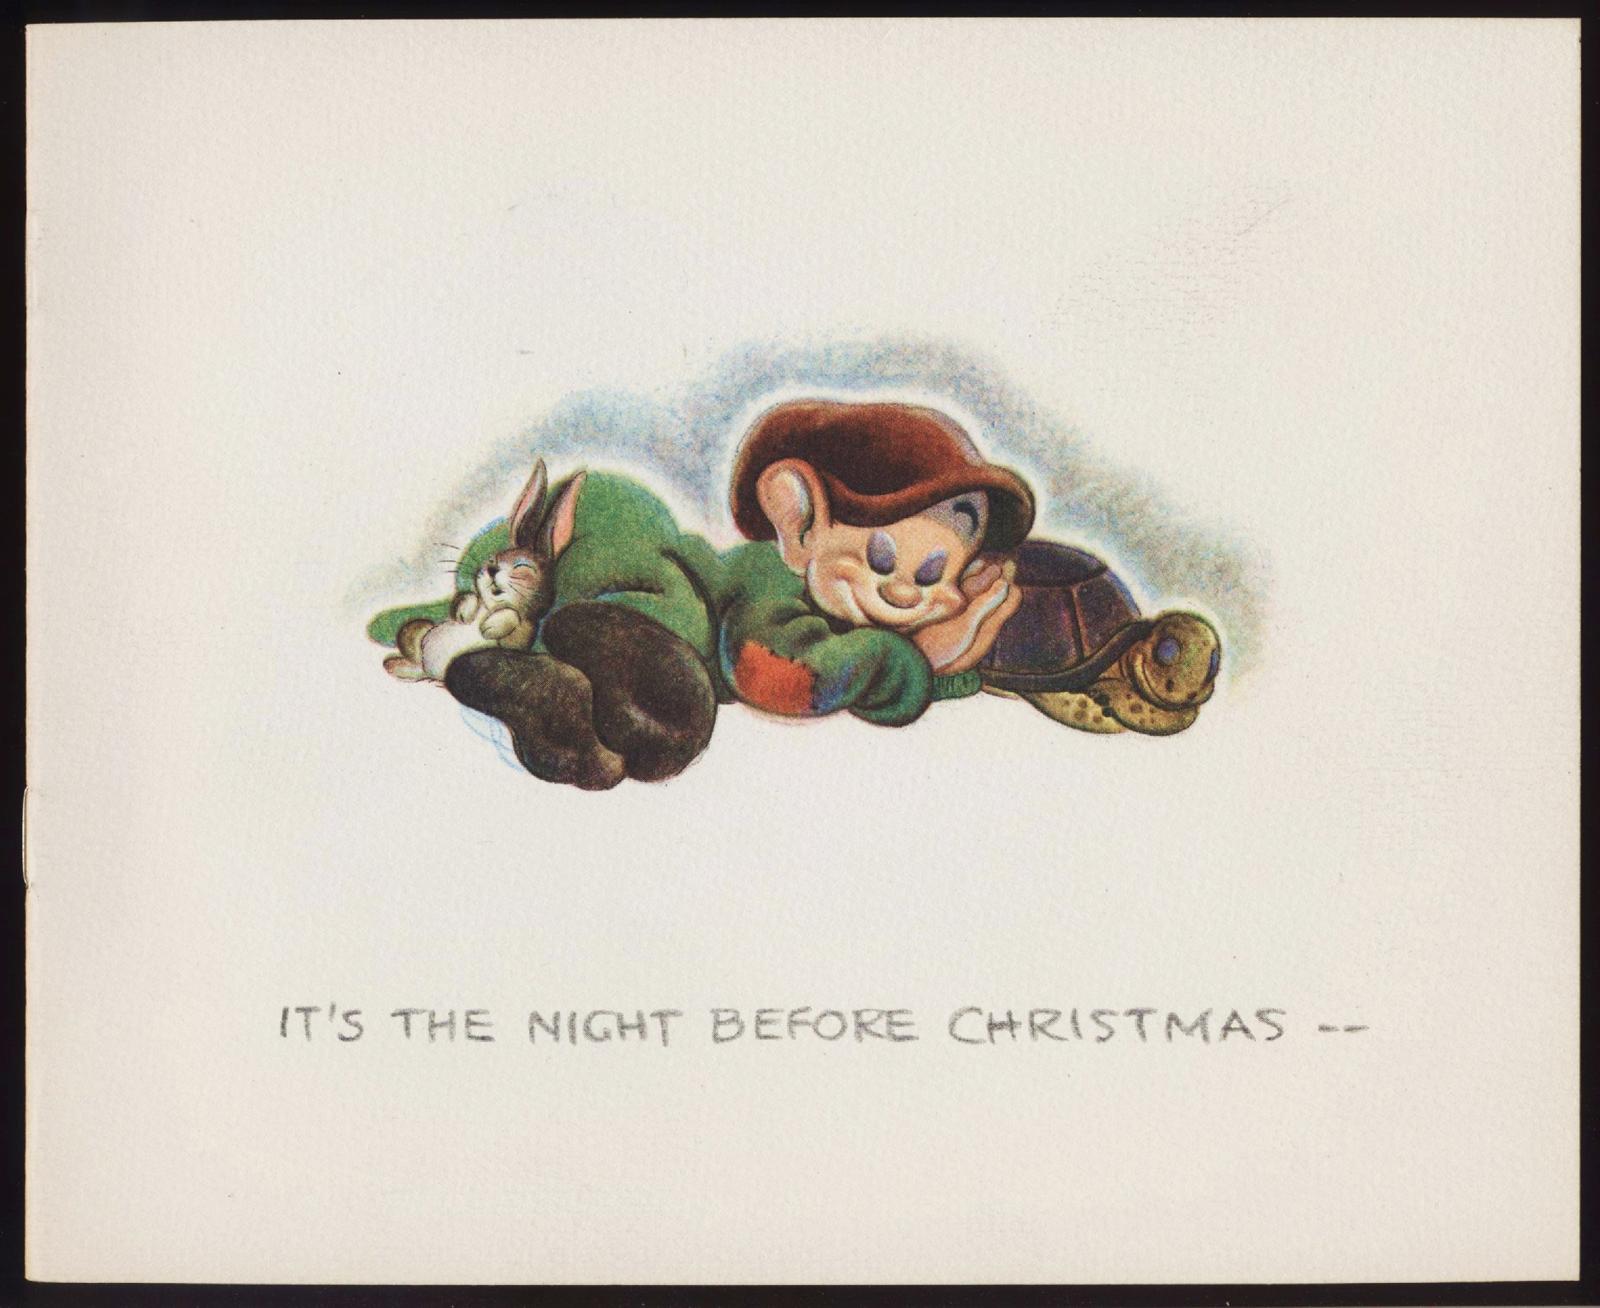 Filmic Light - Snow White Archive: Disney Studio Xmas Cards, 1938-39